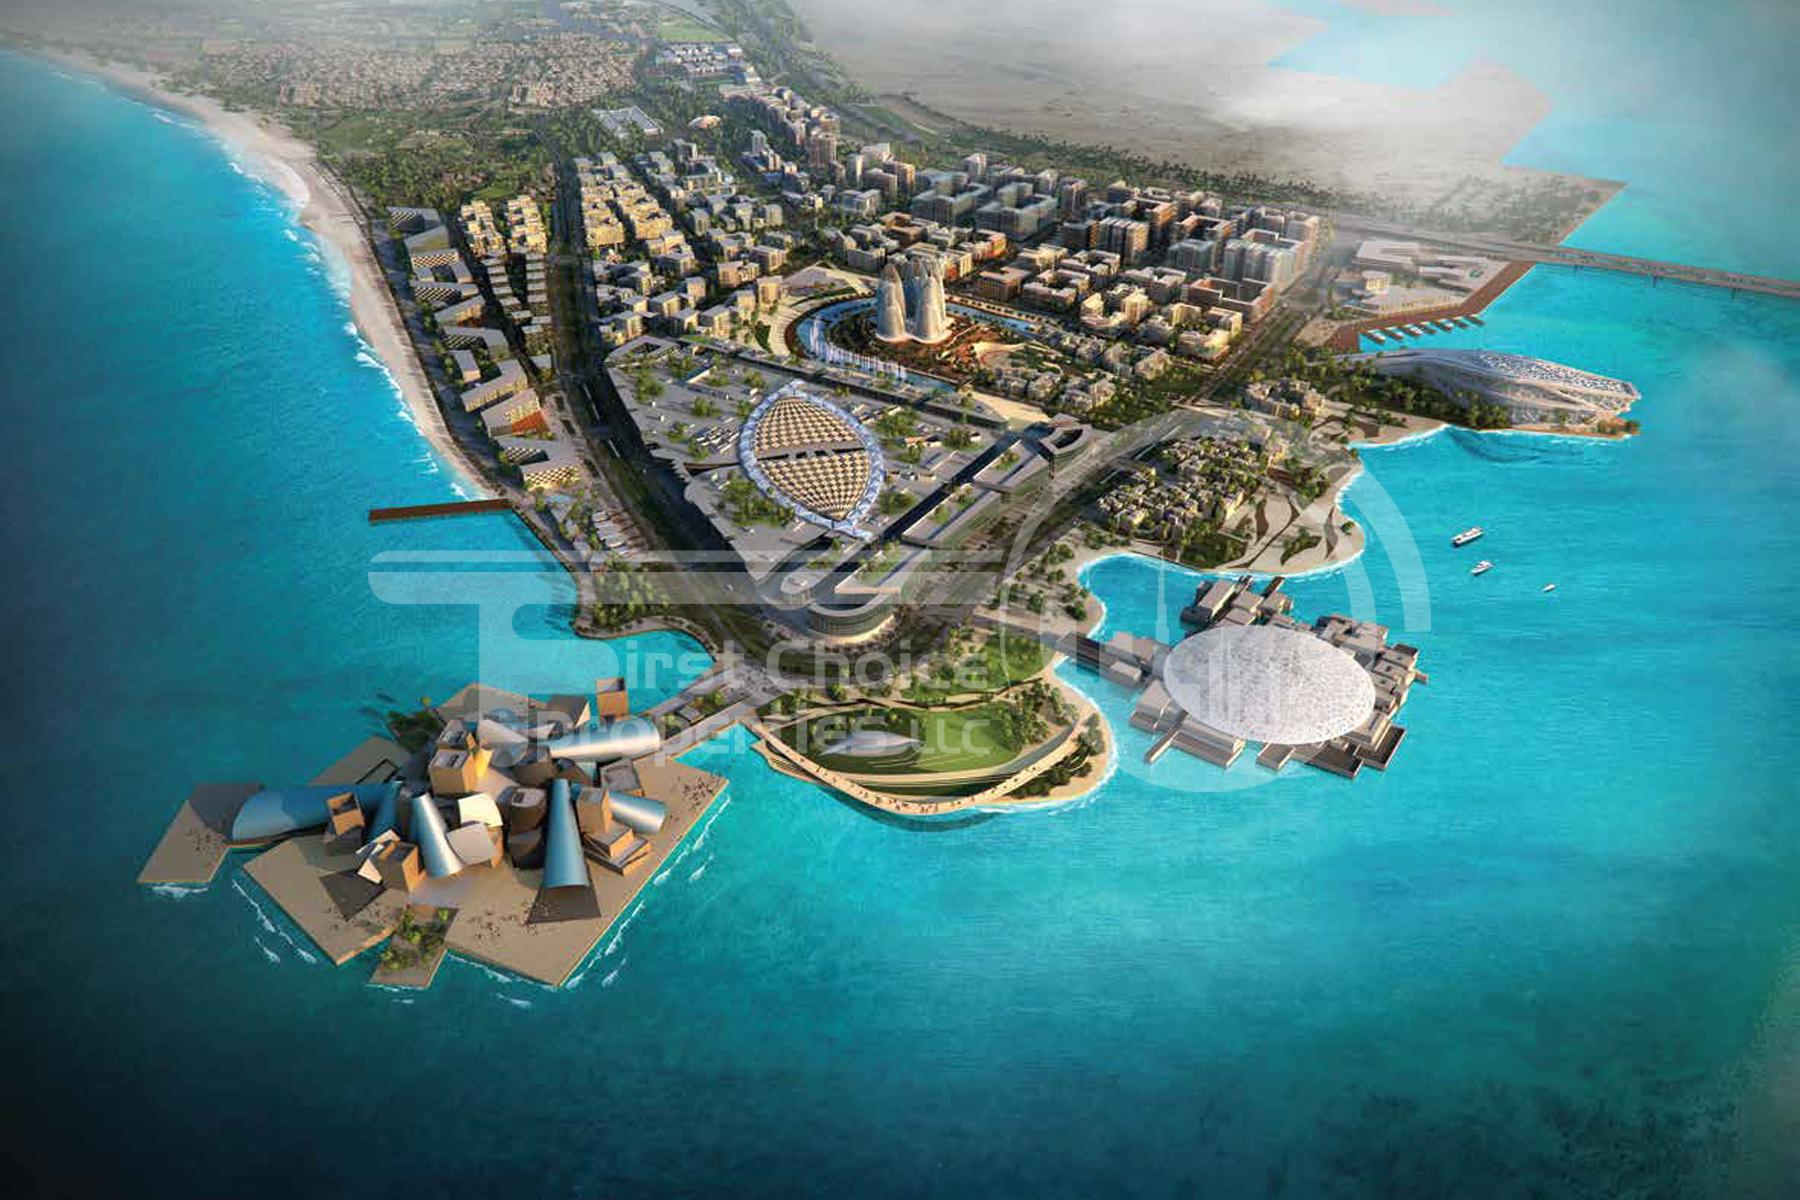 1BR - 2BR - 3BR - 4BR Apartment - Mamsha Al Saadiyat - Saadiyat Island - Abu Dhabi - UAE.jpg